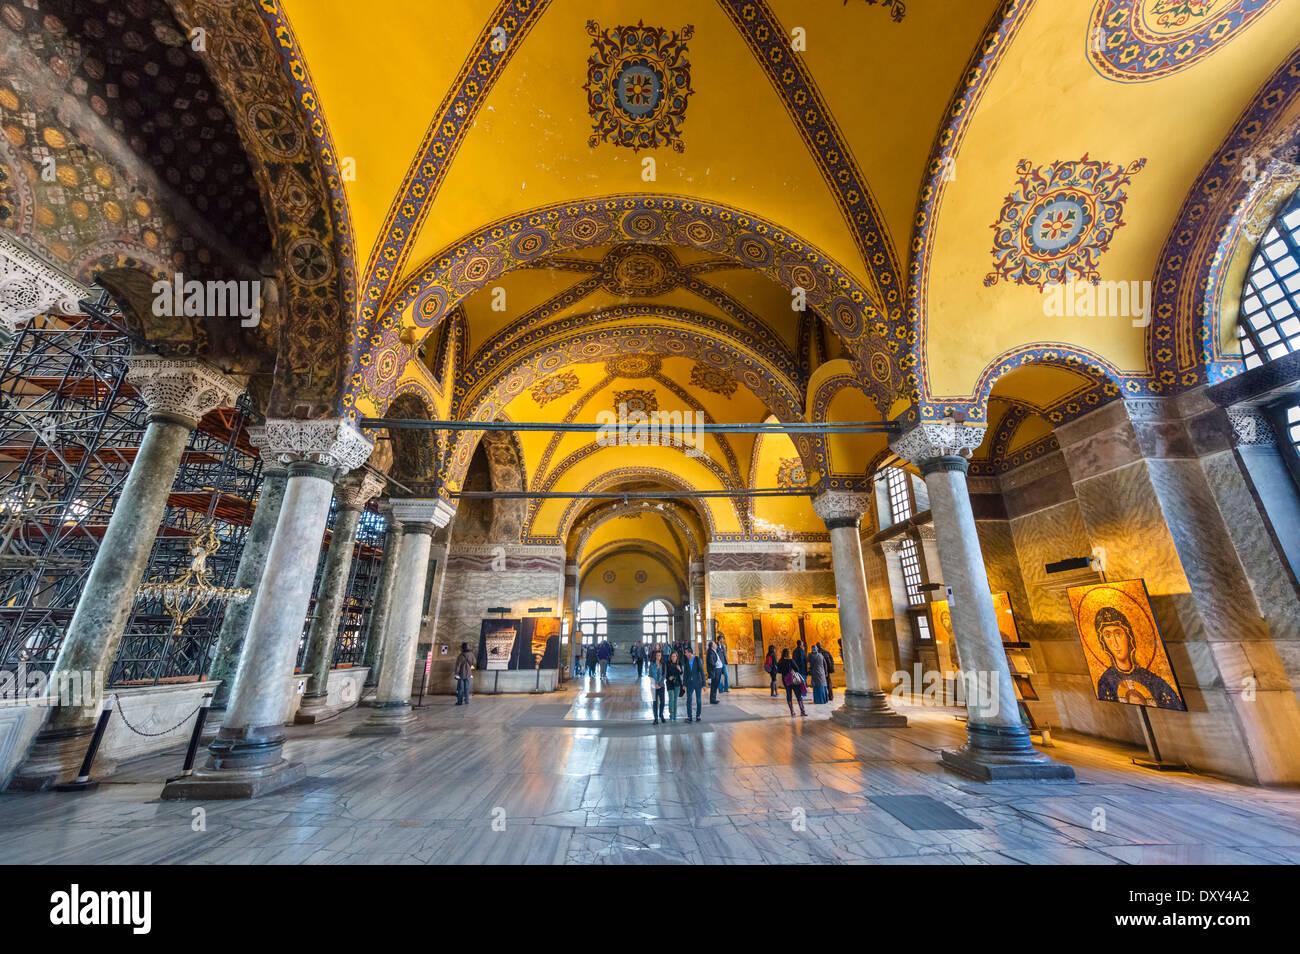 The Upper North Gallery in Hagia Sophia (Aya Sofya), Sultanahmet district, Istanbul,Turkey Stock Photo